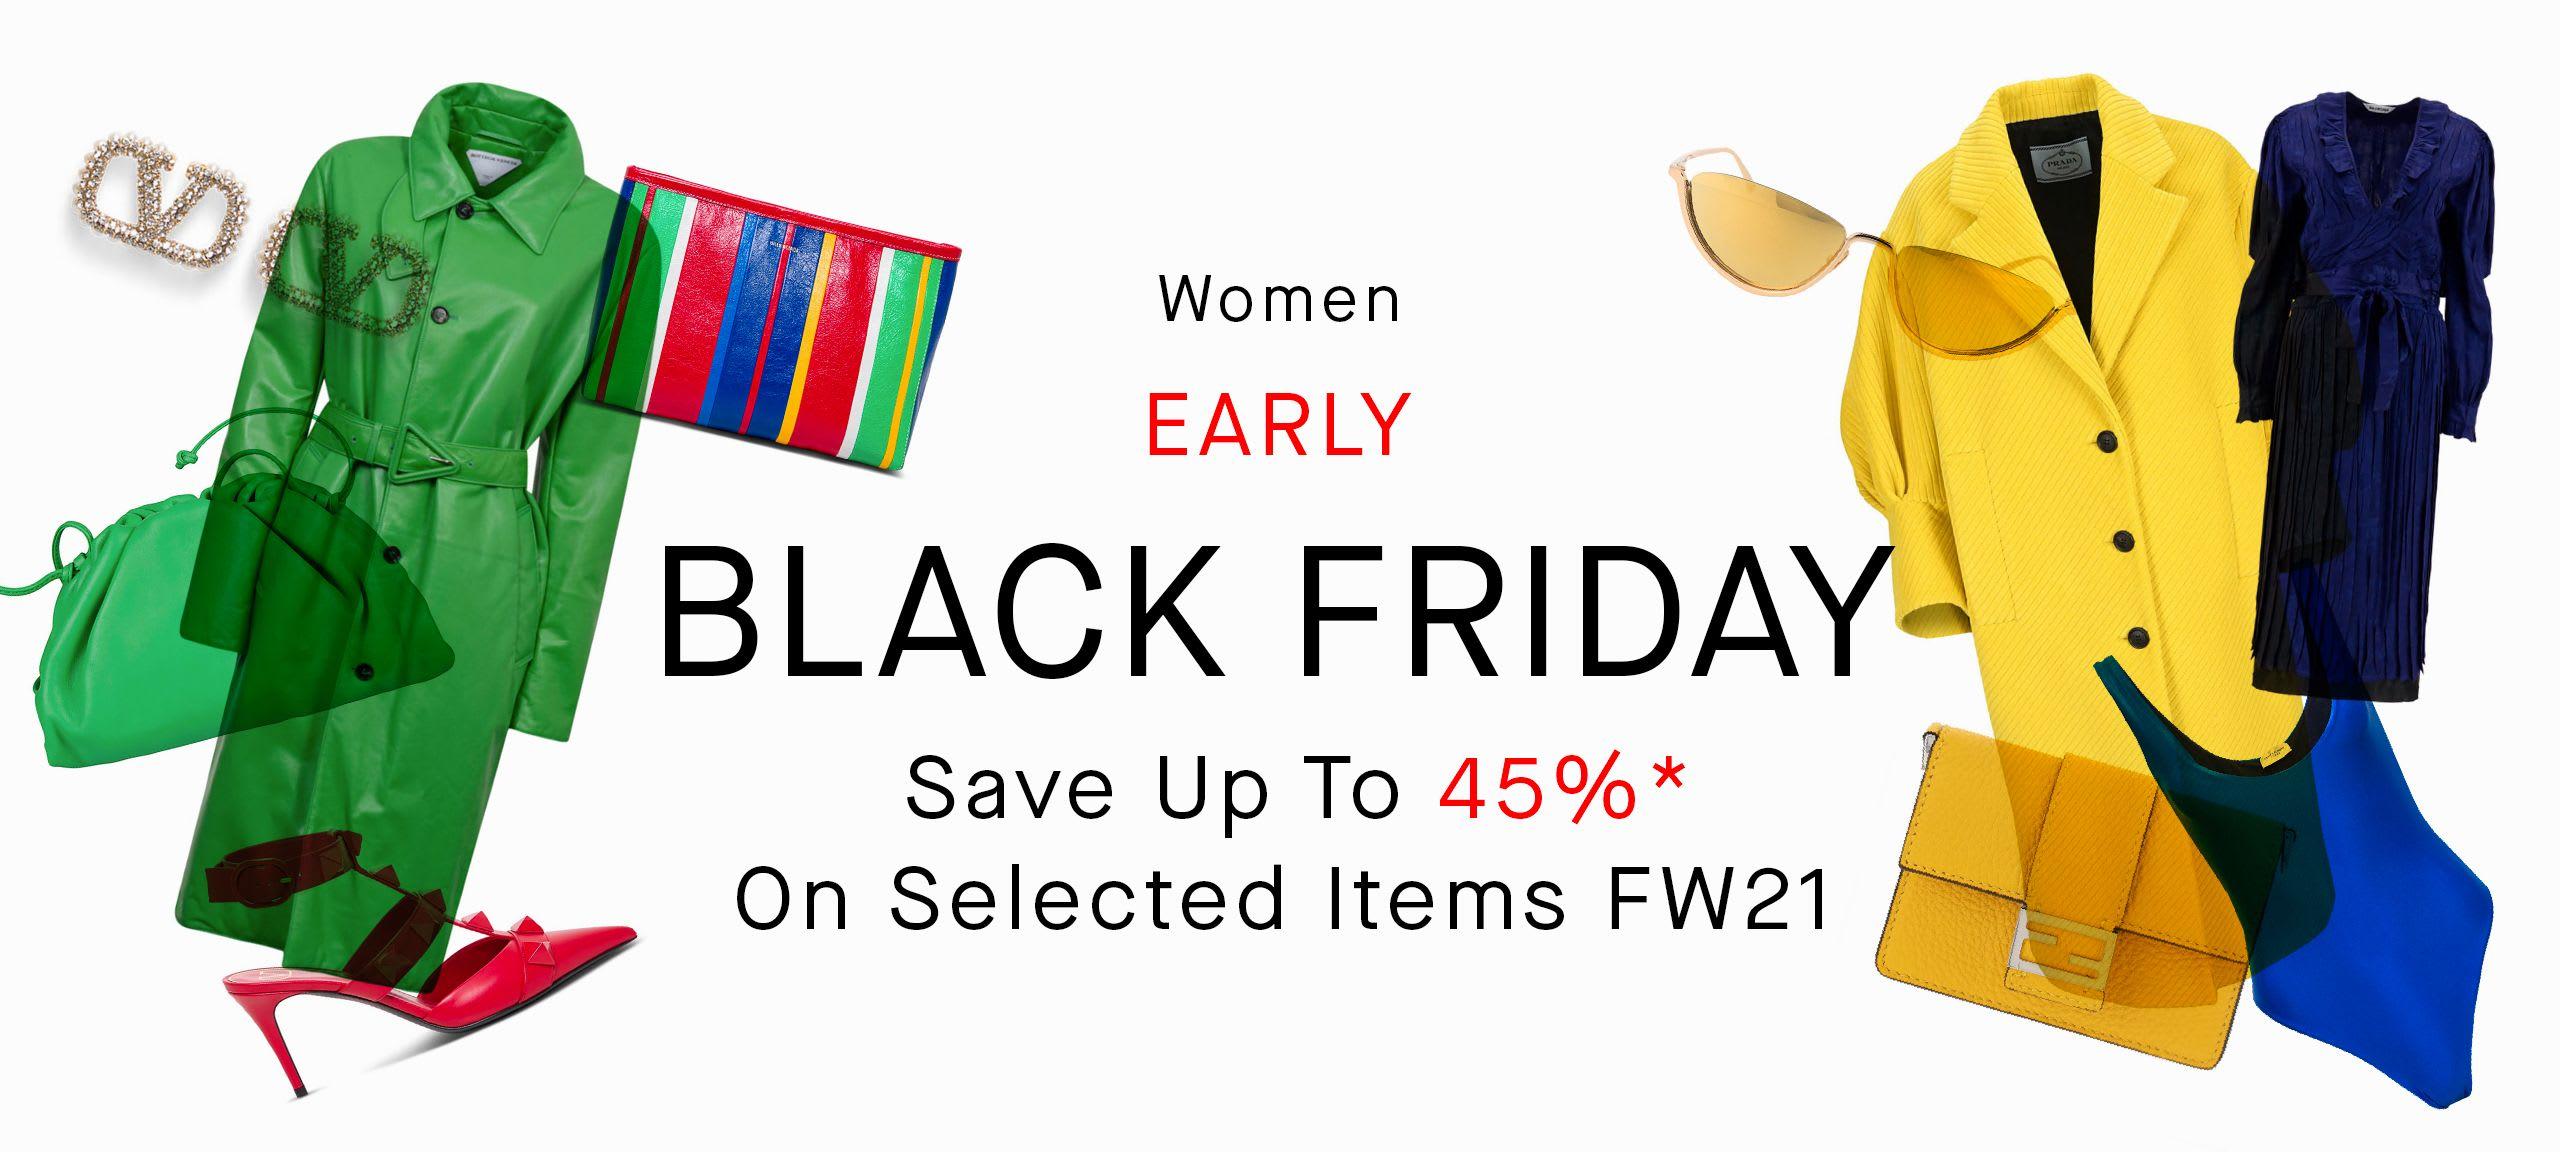 Women Black Friday Sale by italist